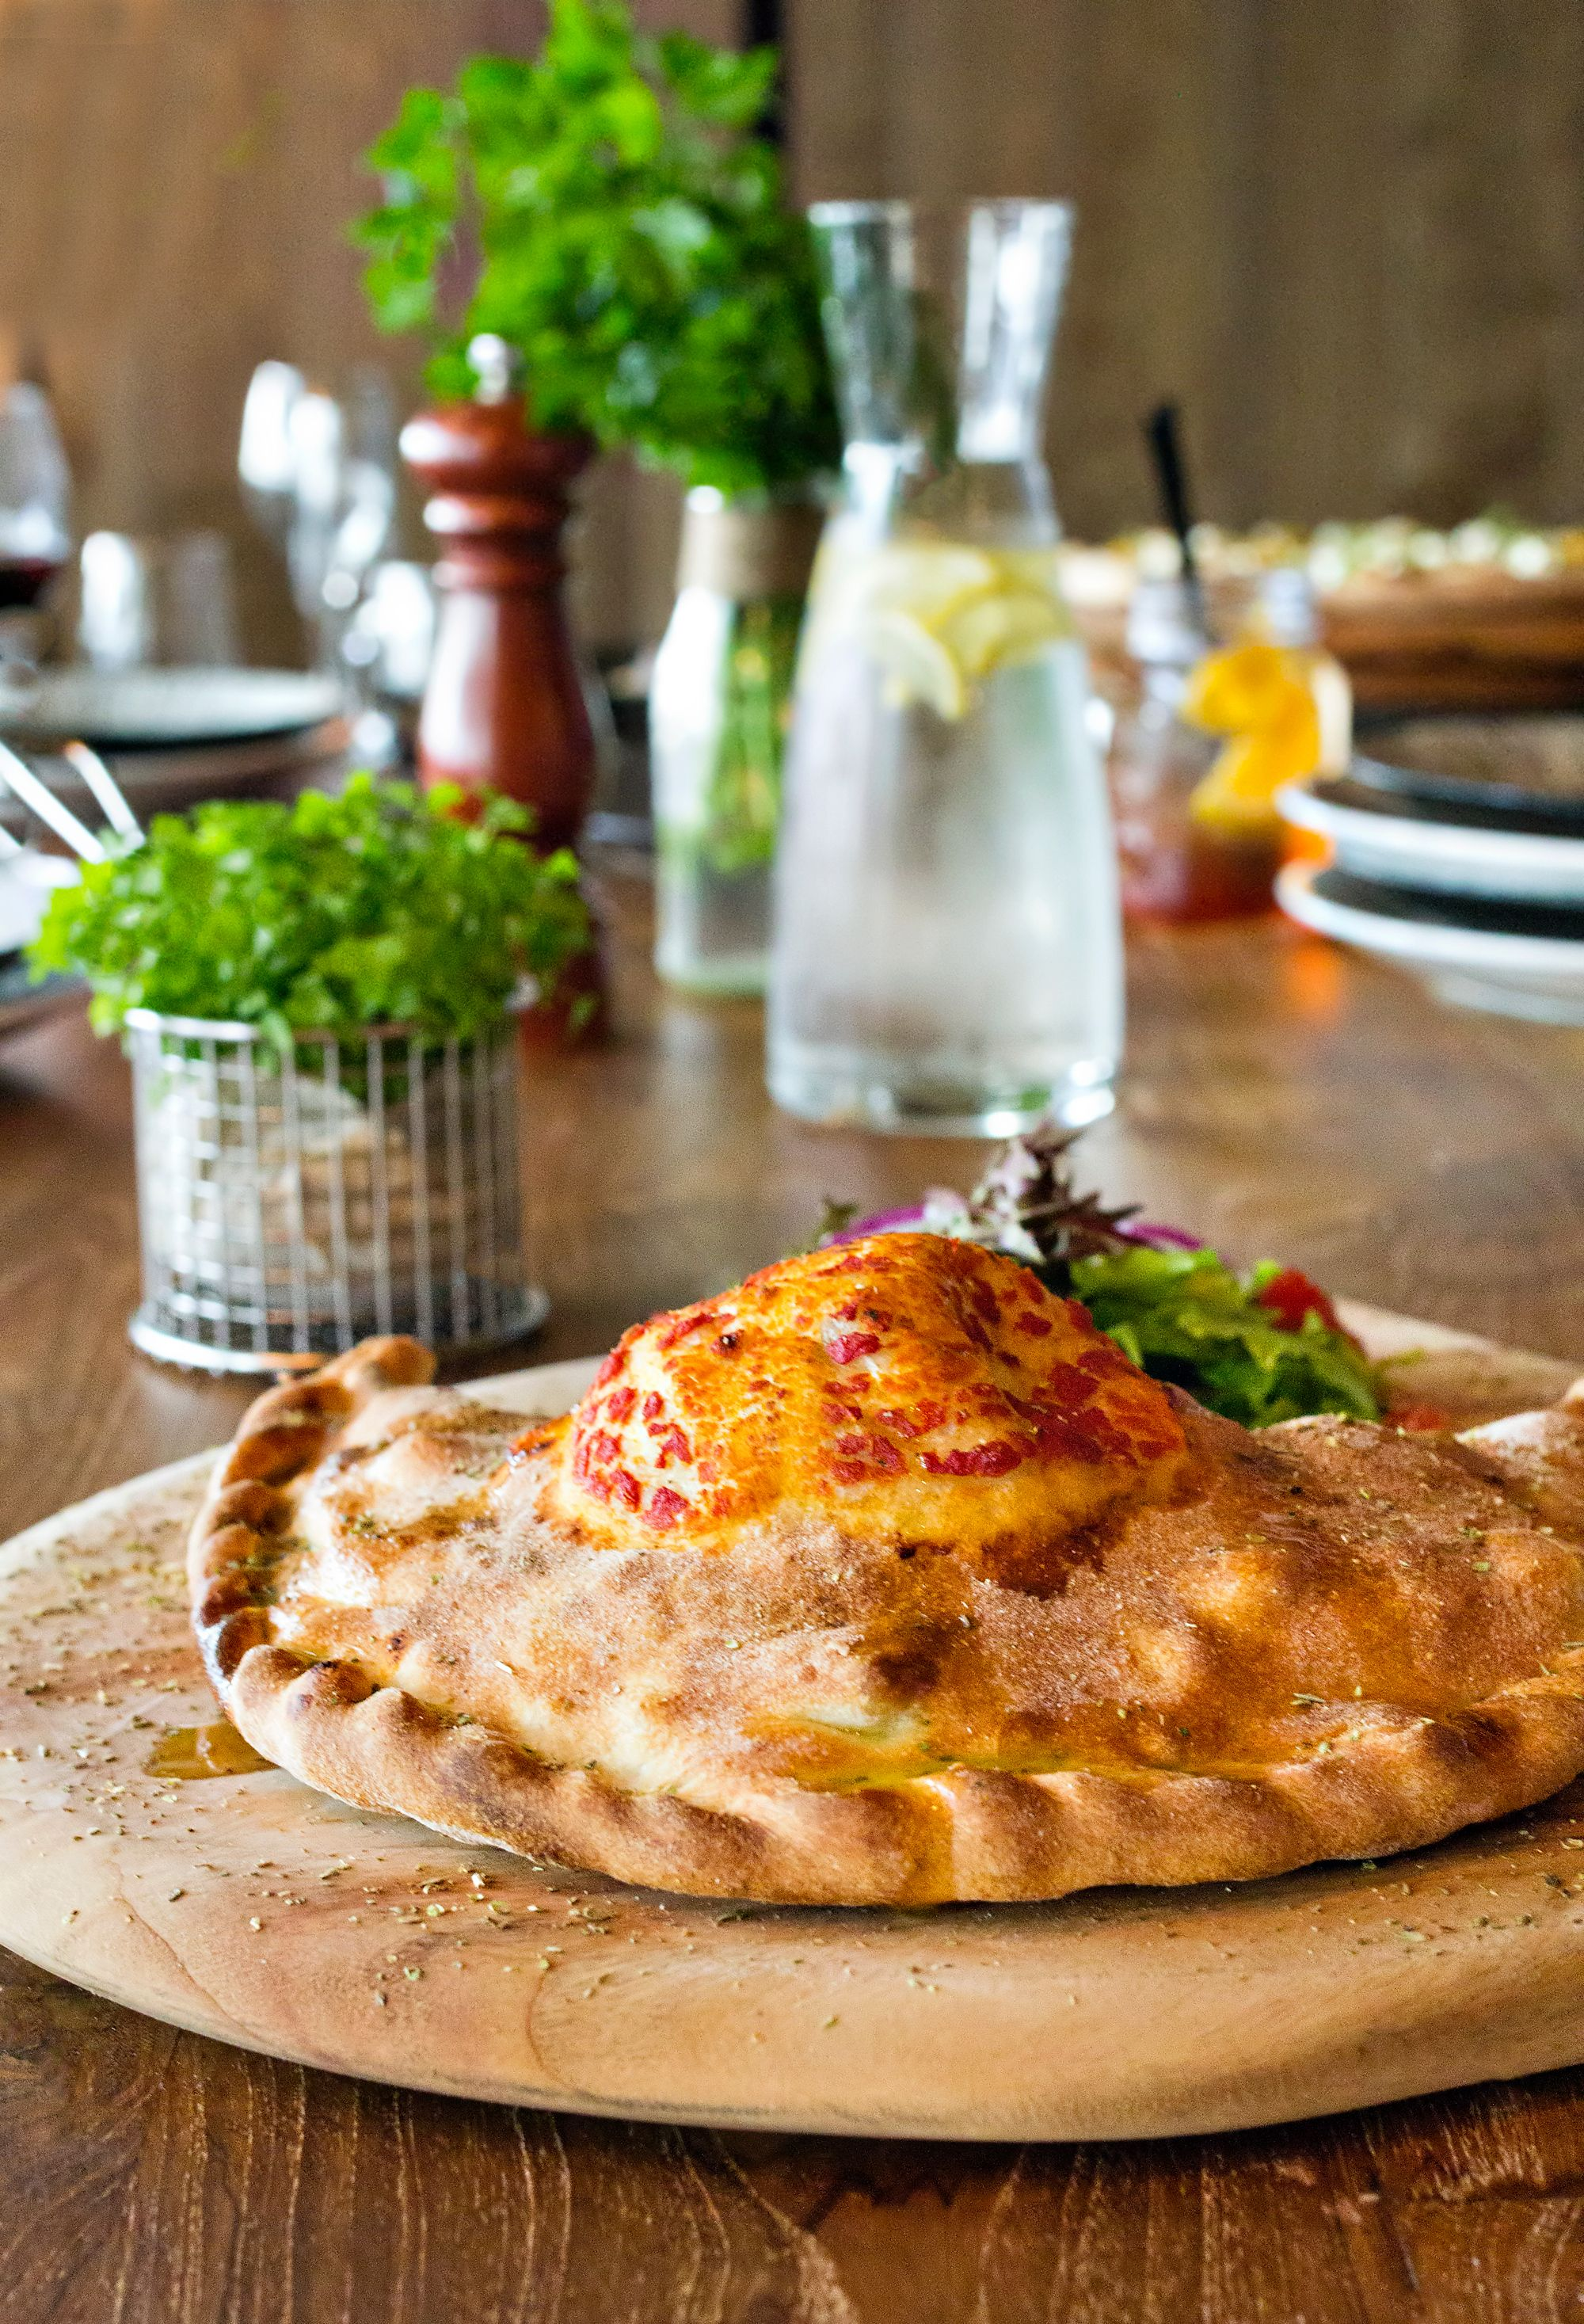 Casa ristorante italiano italian recipes food breakfast